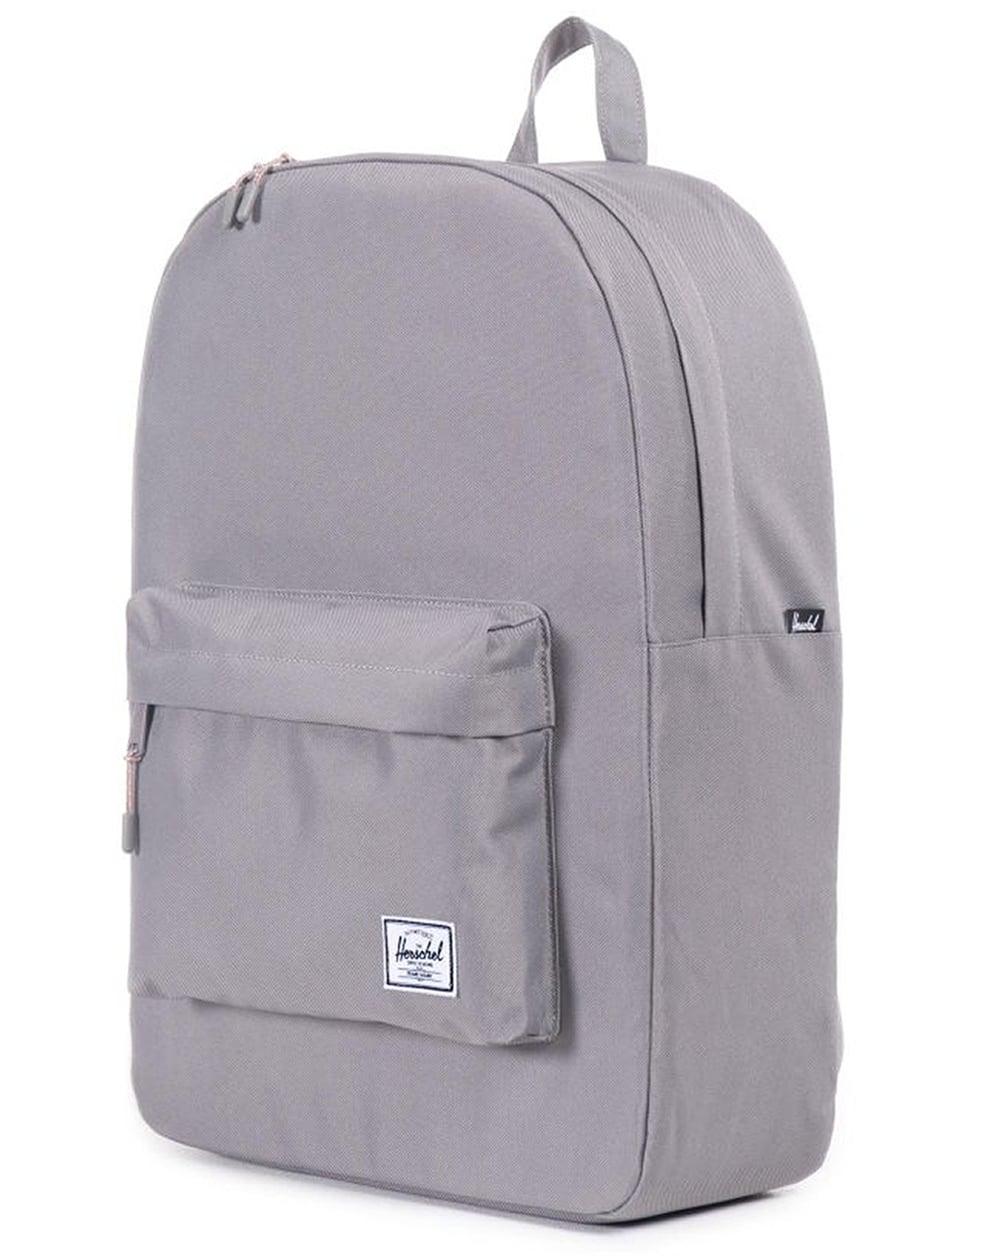 Herschel Herschel Classic Backpack Grey d4af7c08b7d6d